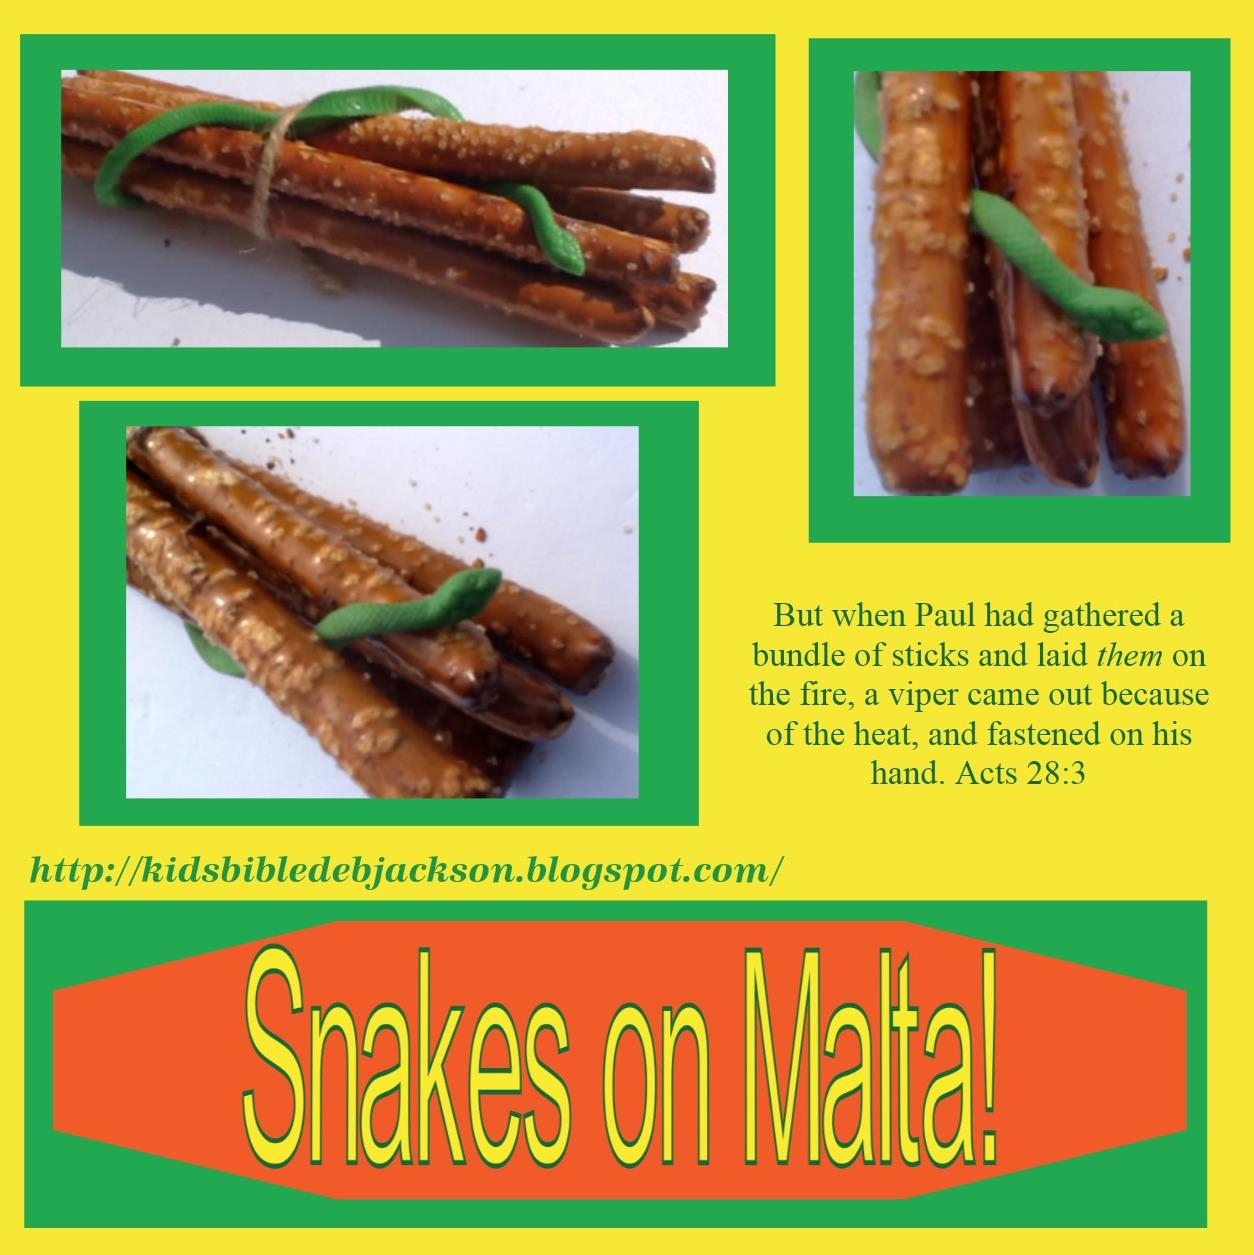 http://kidsbibledebjackson.blogspot.com/2013/03/paul-gets-bit-by-snake-on-malta.html